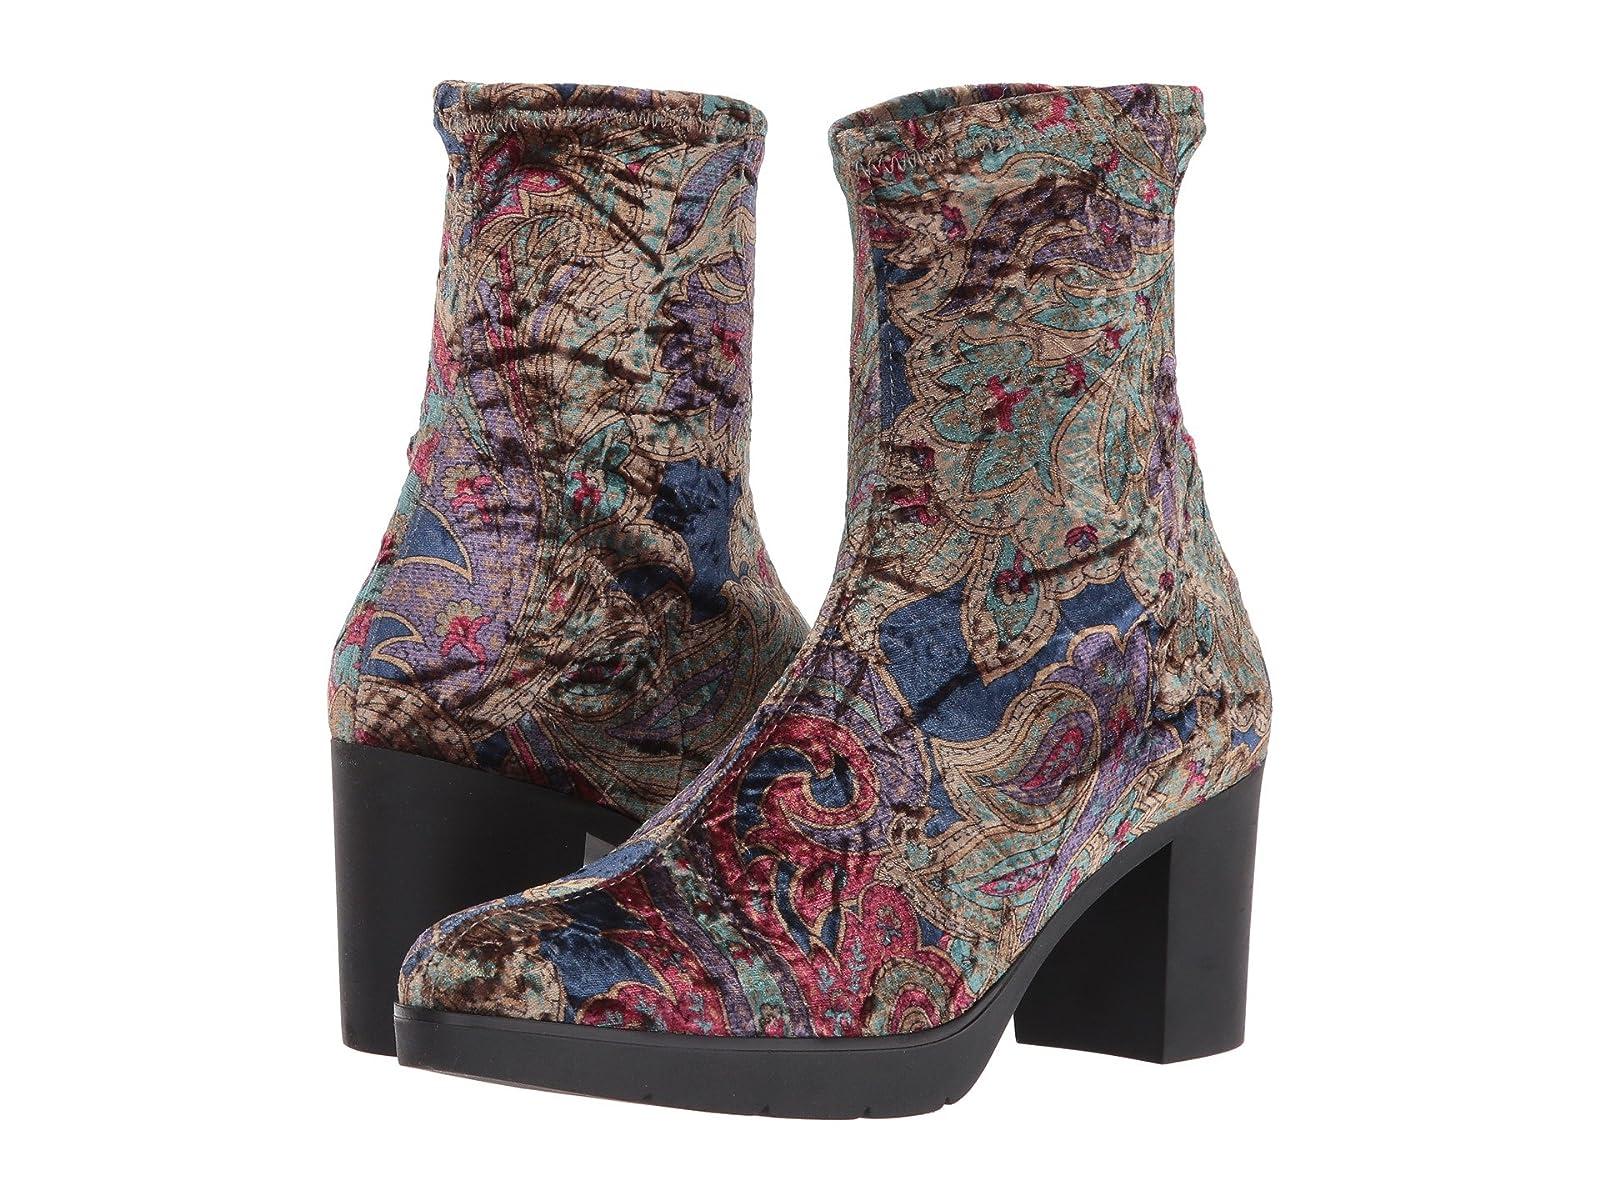 Toni Pons Flavia-LmCheap and distinctive eye-catching shoes